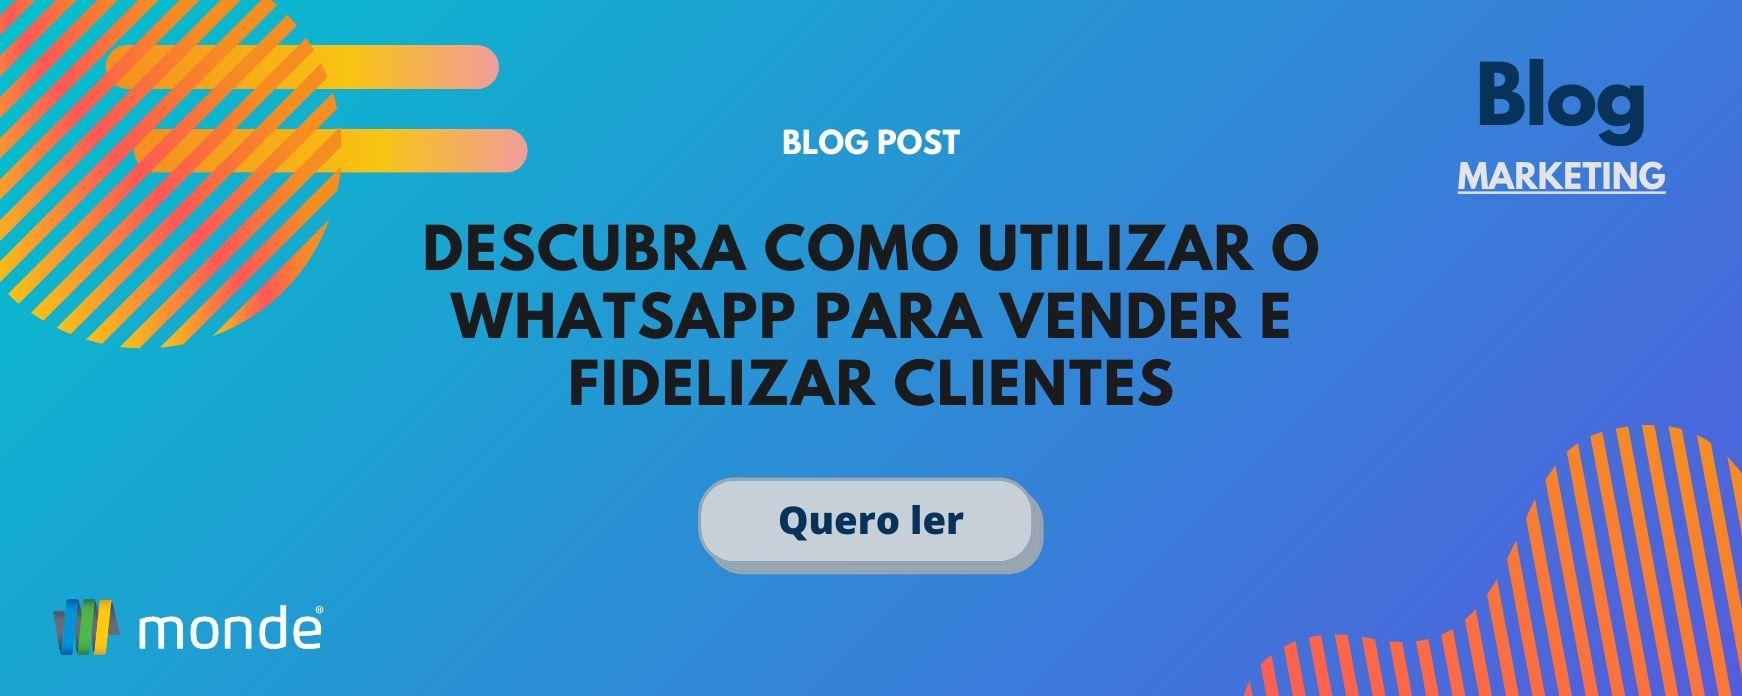 whatsapp para fazer vendas